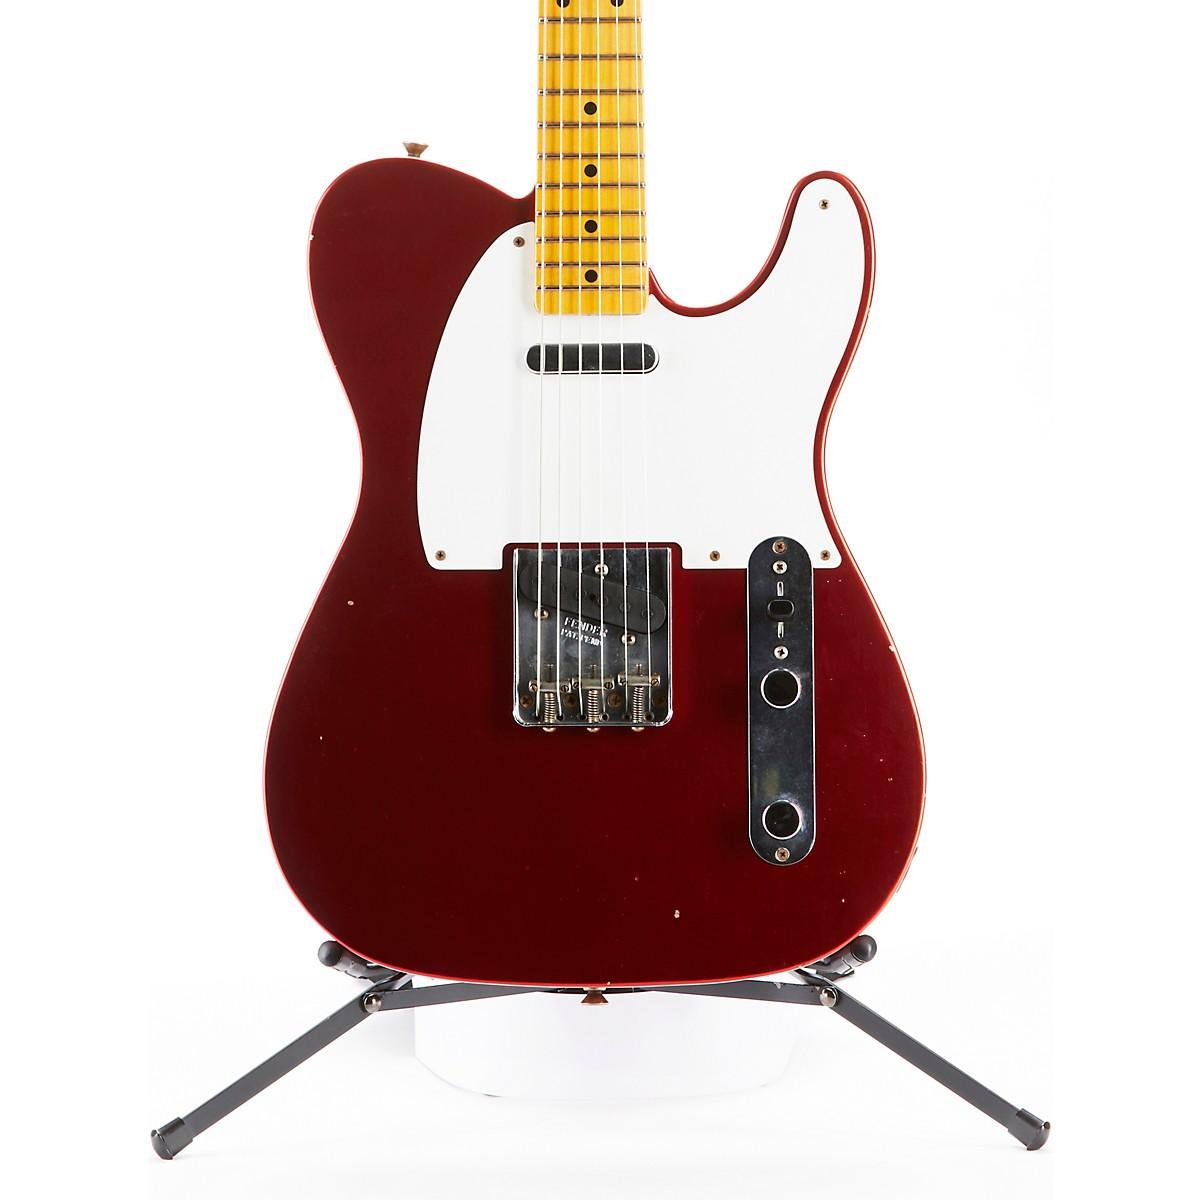 Fender Custom Shop 1957 Telecaster Journeyman Relic Electric Guitar